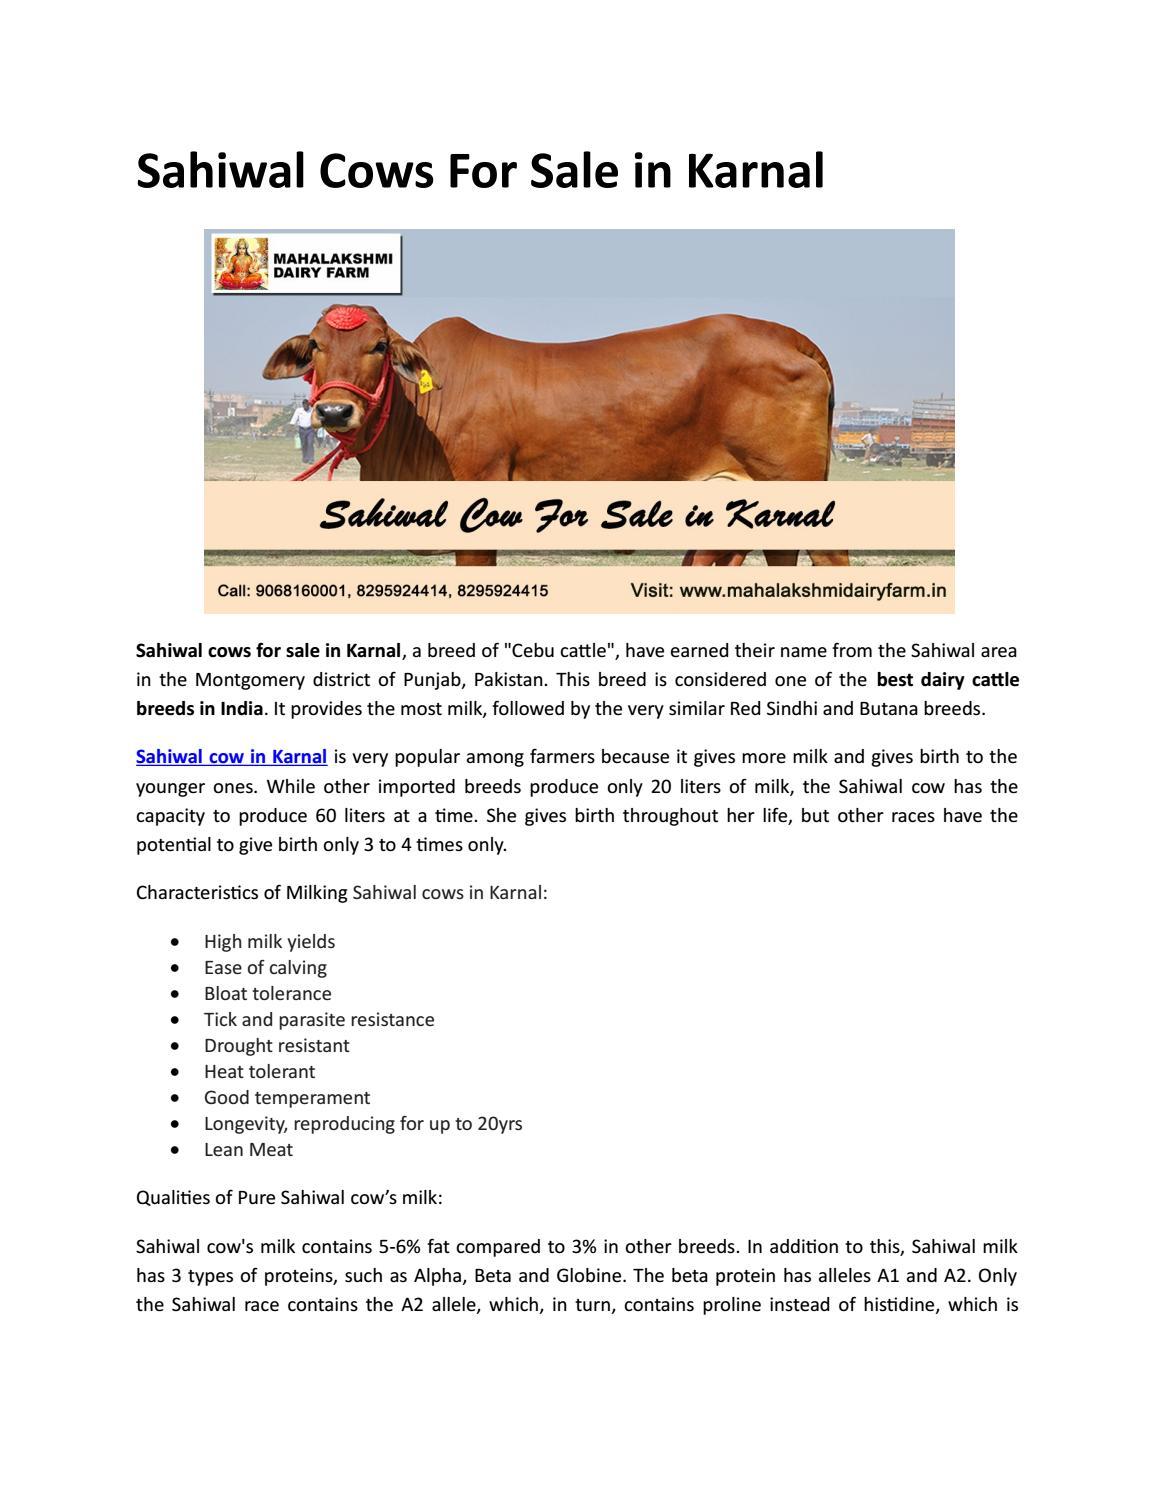 Sahiwal Cows For Sale in Karnal by Mahalakshmi Dairy Farm